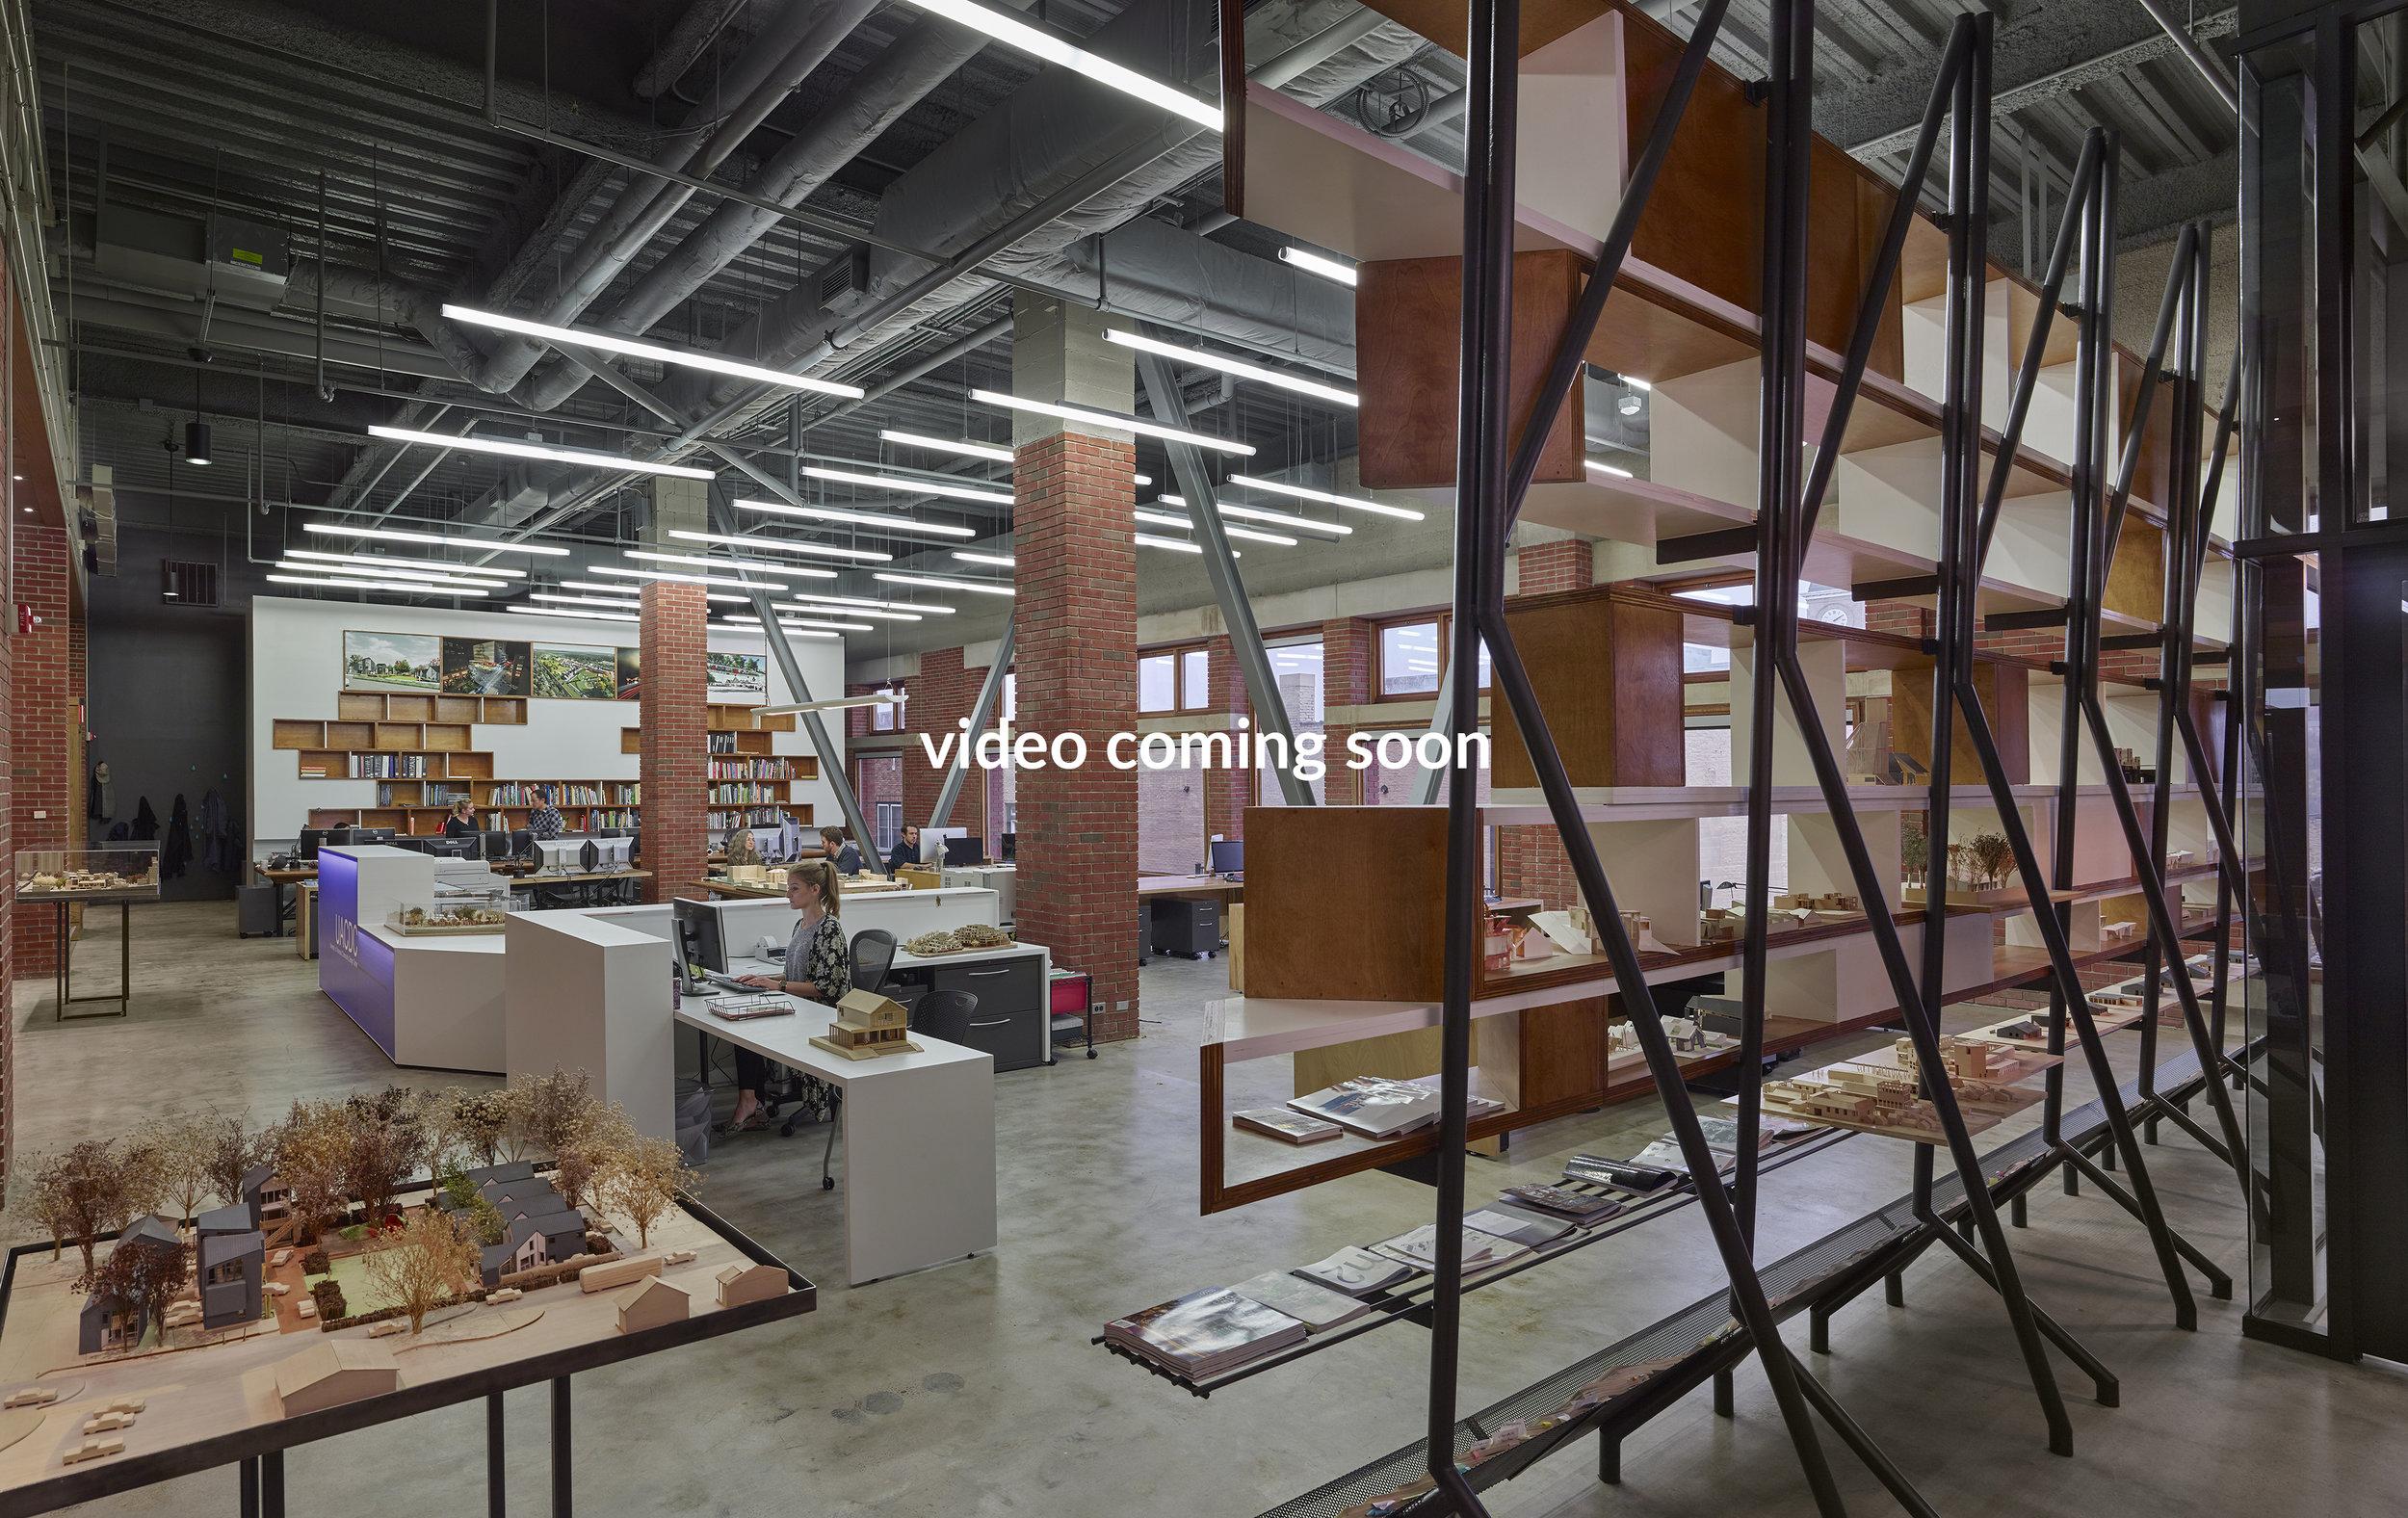 TH111715_UofA_CDC_P0317 video coming soon.jpg